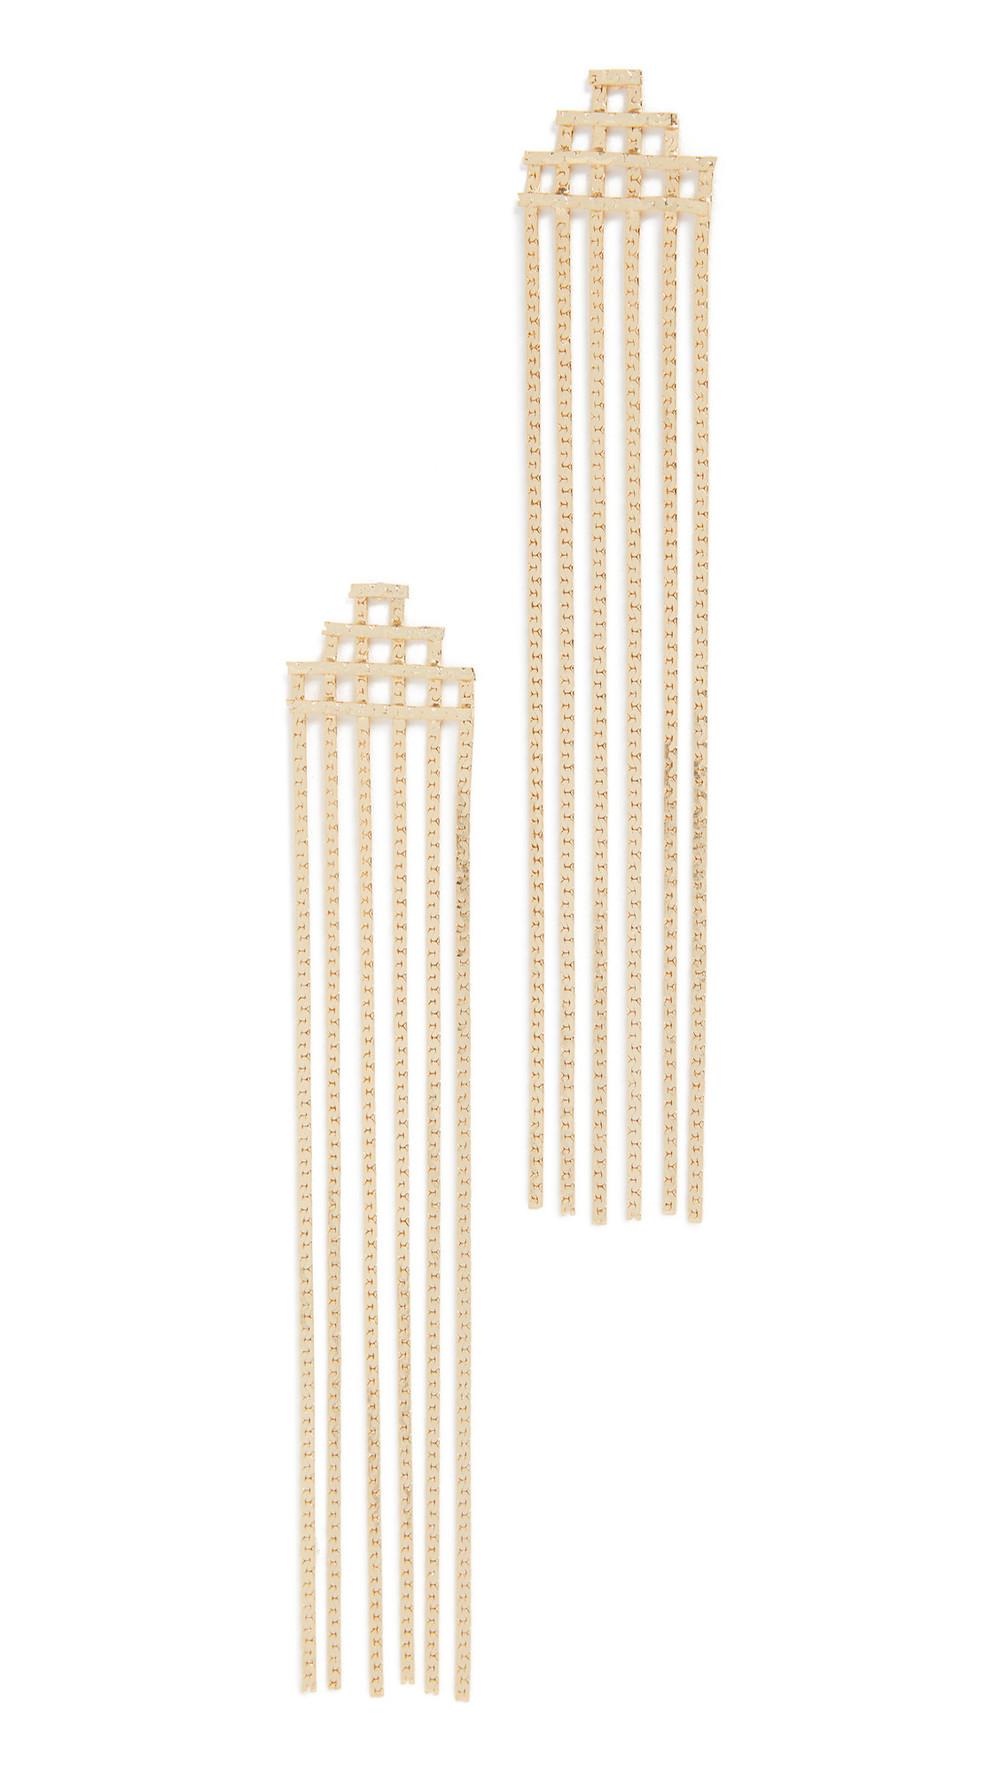 Jules Smith Disco Fringe Earrings in gold / yellow